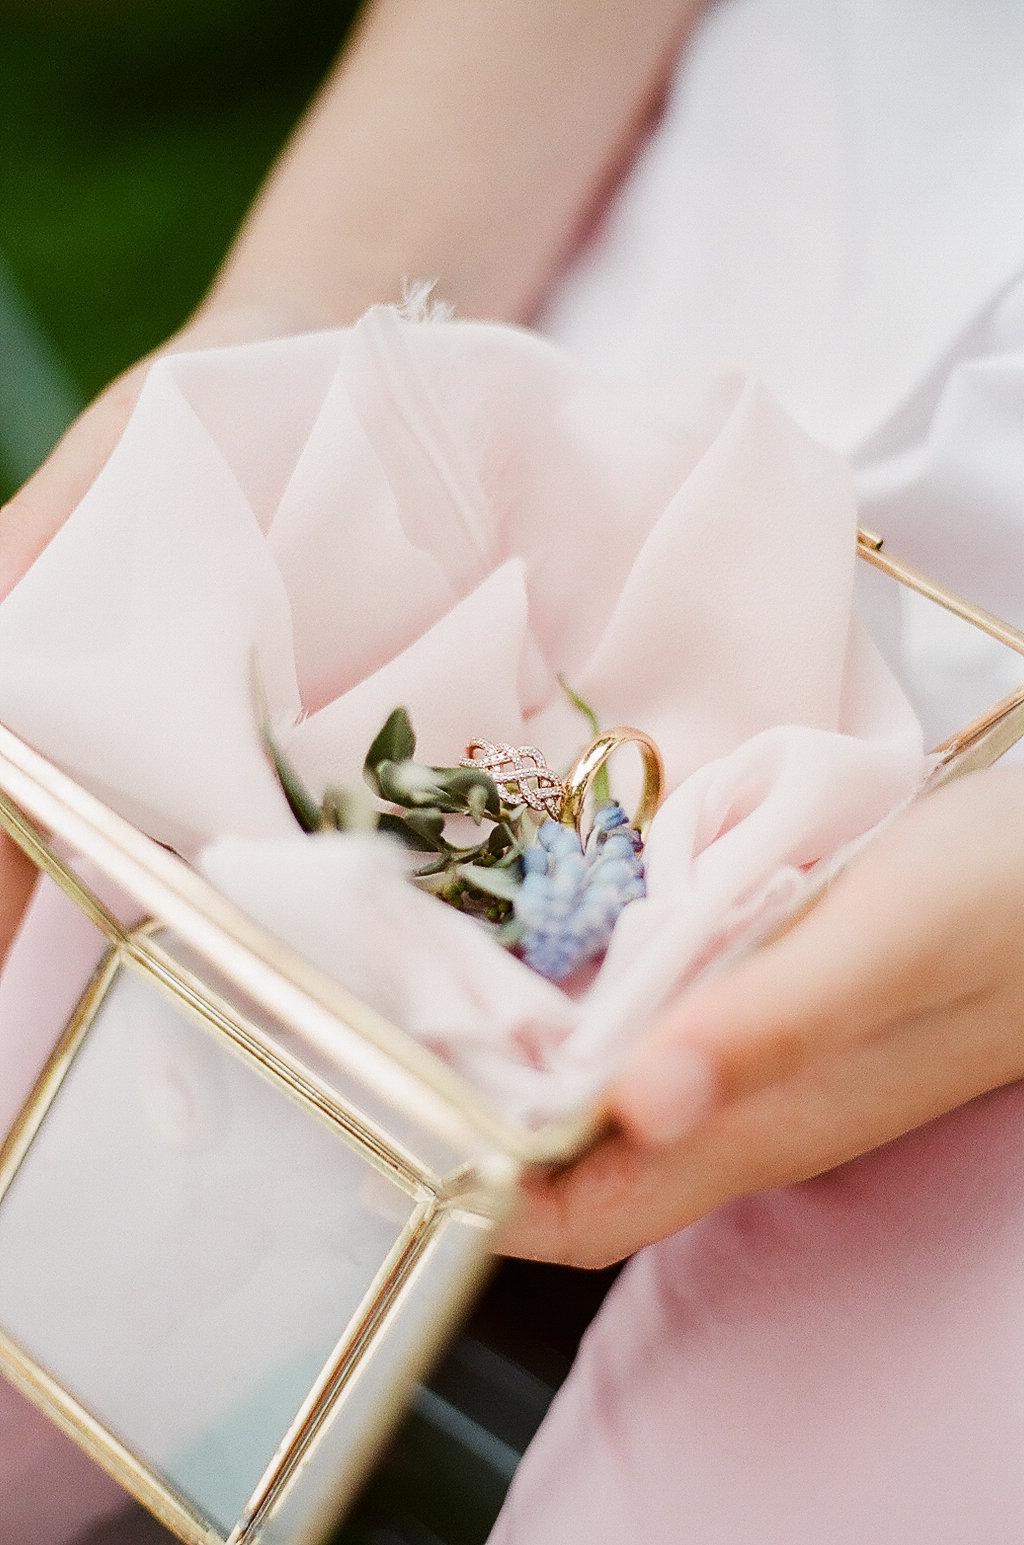 le coeur dans les etoiles - wedding planner - provence - luberon - alpilles - drome - vaucluse - sardaigne - italie - organisation - mariage - shooting - dolce vita - valery villard-296